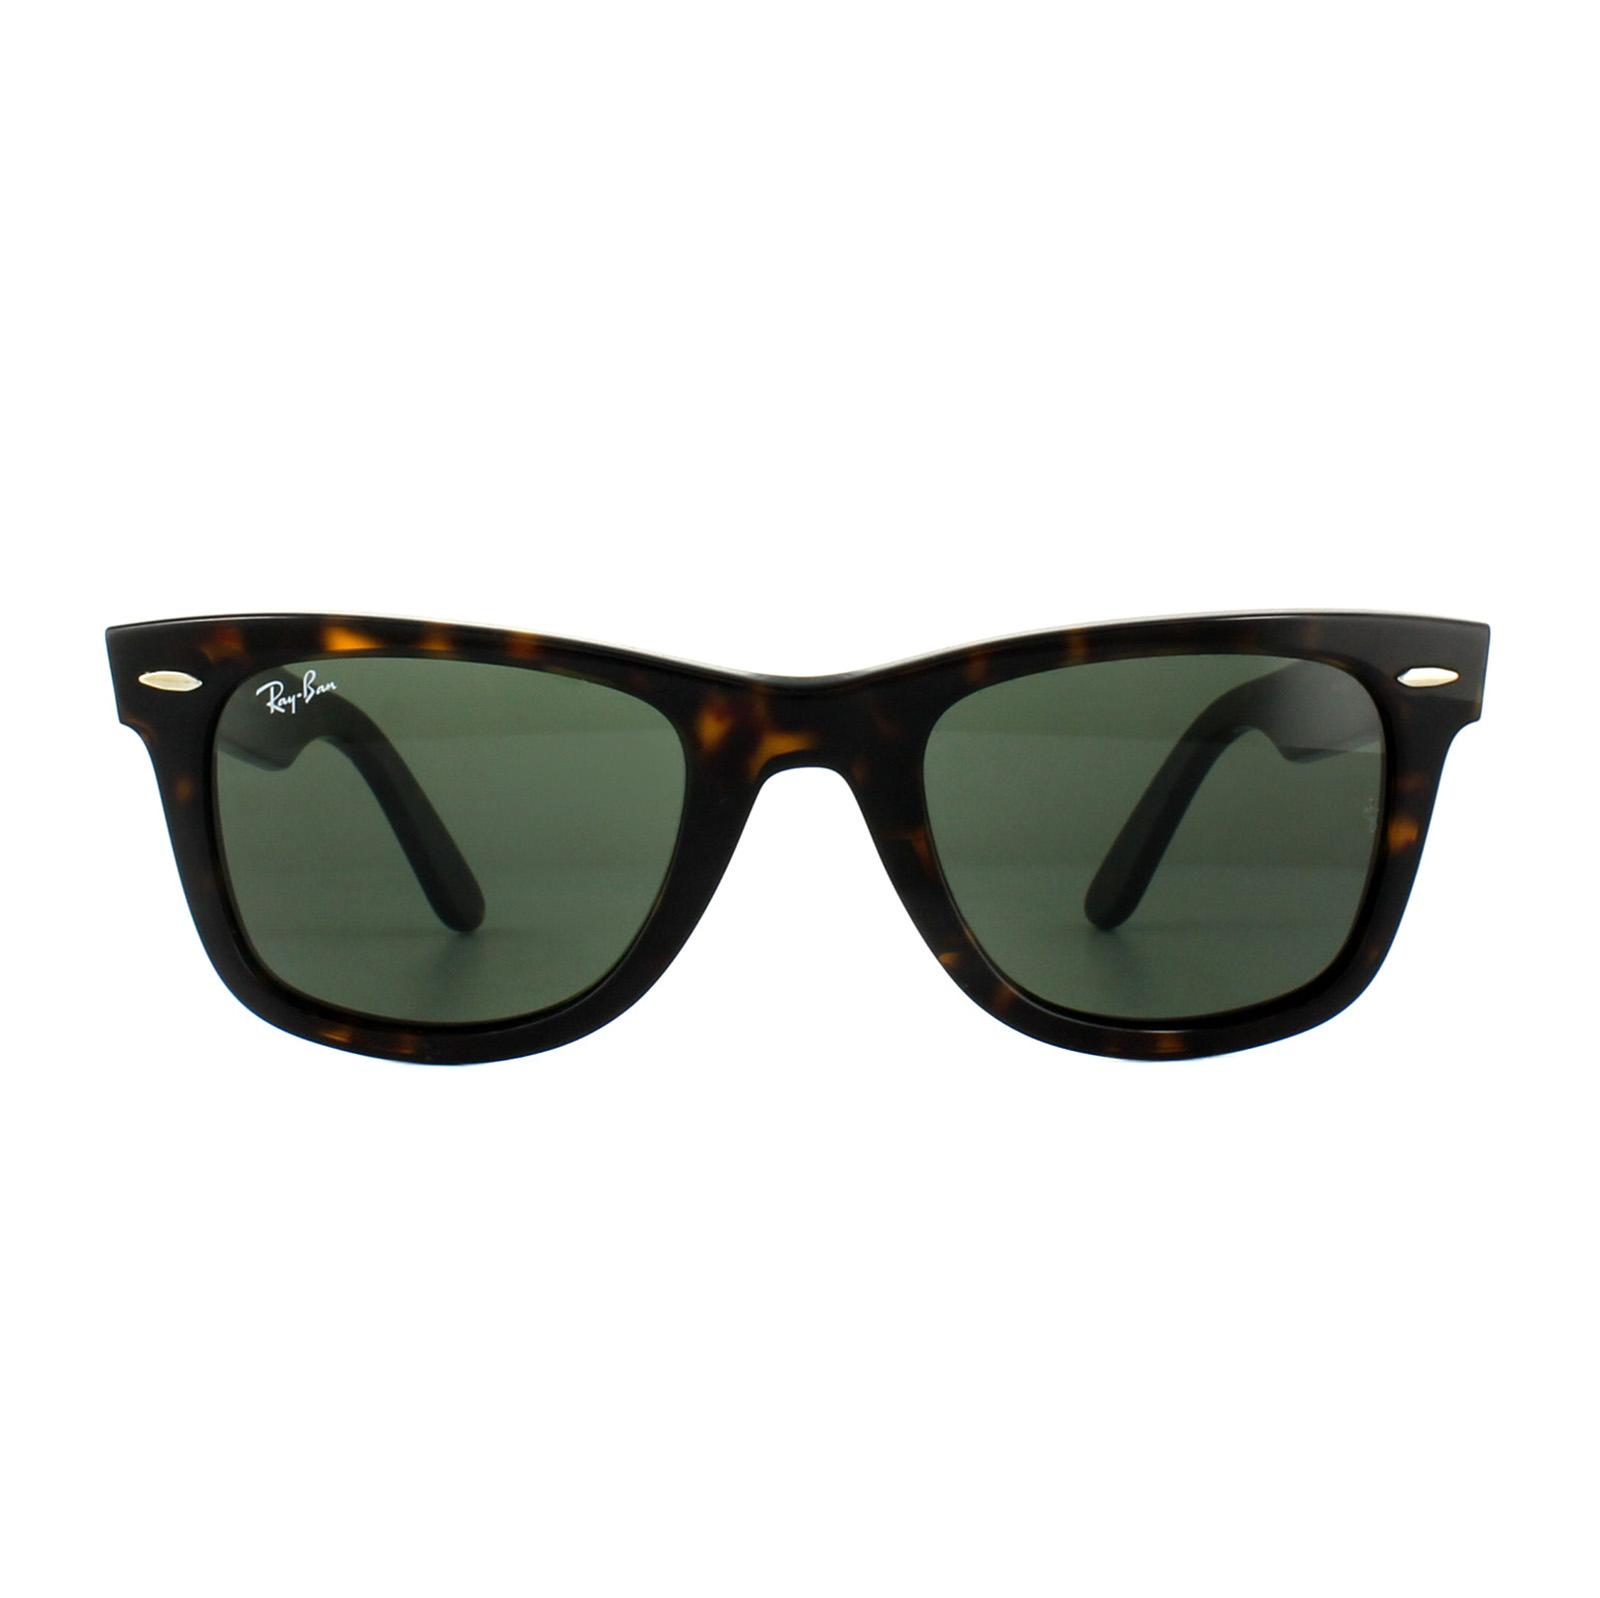 de088c66b0a ... Ray-Ban Sunglasses Wayfarer 2140 902 Tortoise Green G-15 Medium 50mm  Thumbnail 2 ...